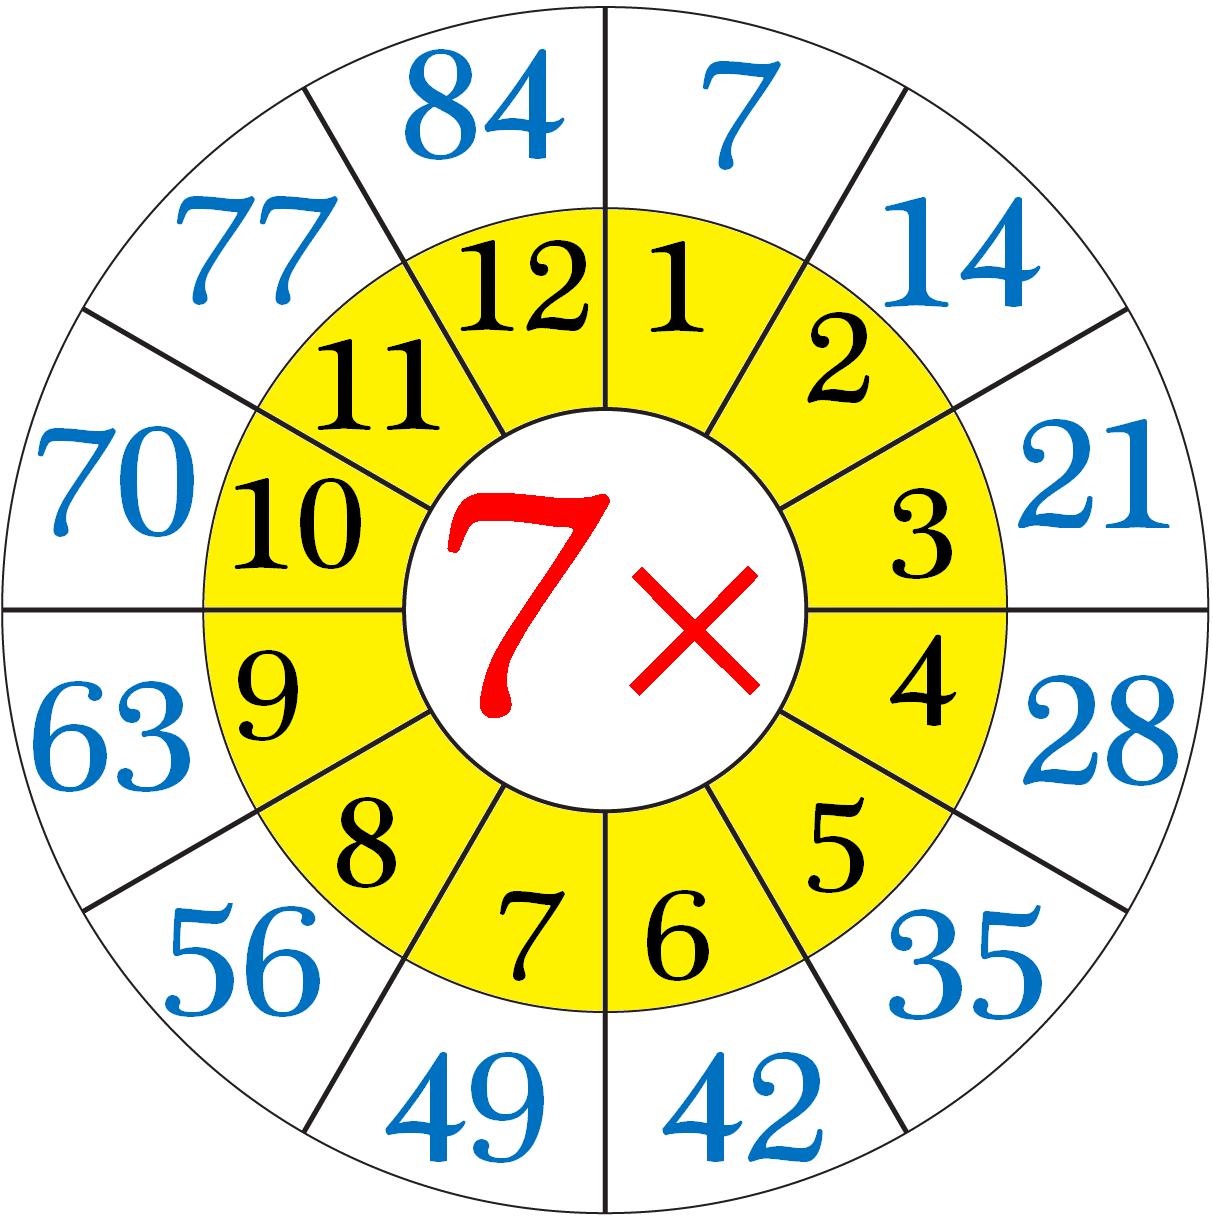 Arp m tablosu g ster arp m tablosu for Table 7 multiplication